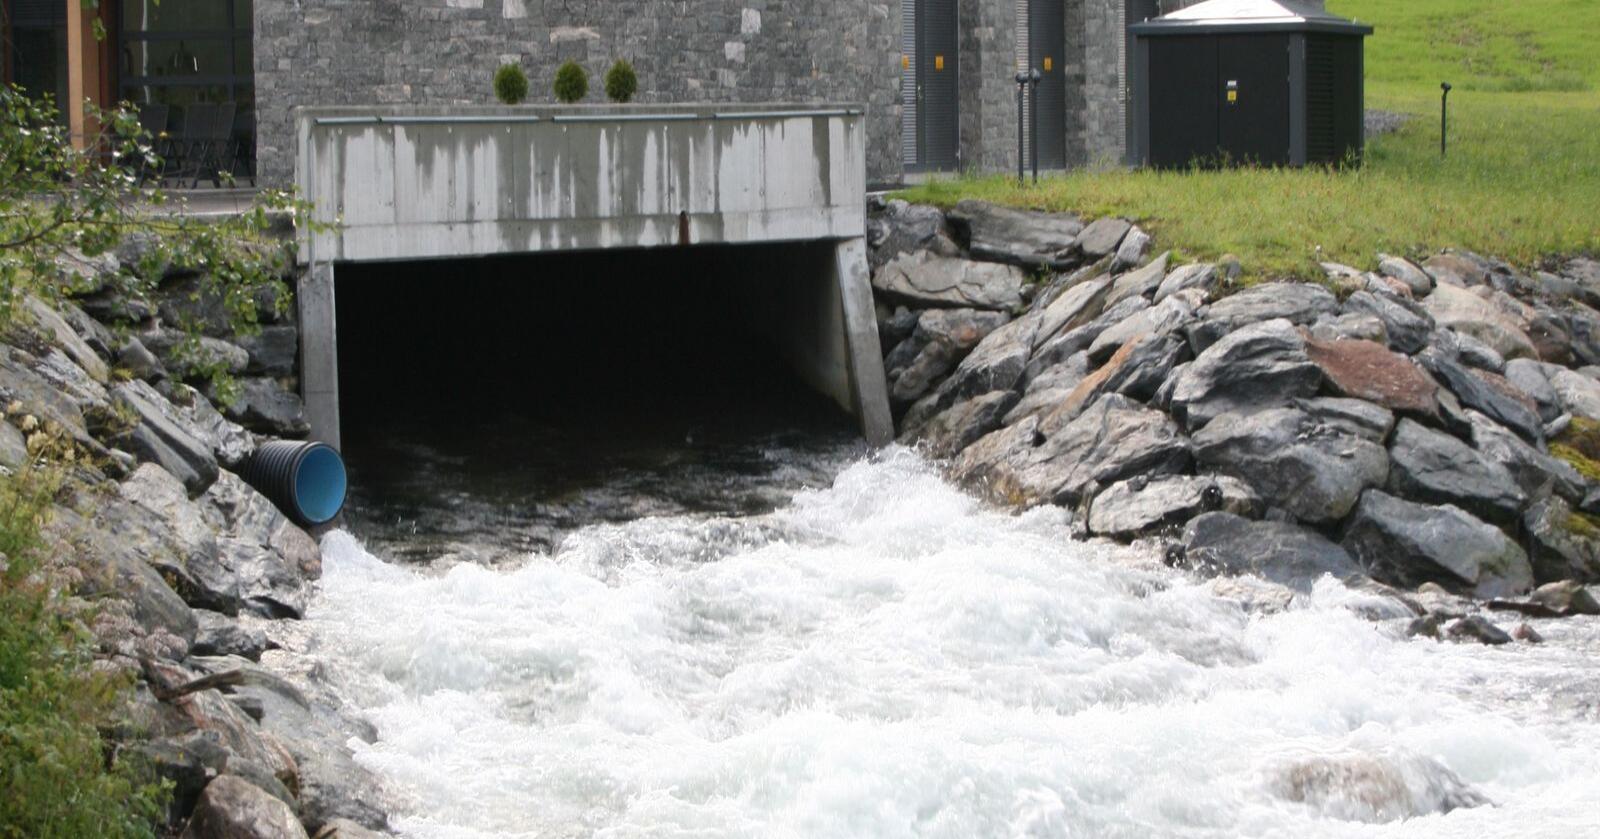 Tryggestad Kraft og Litlebø kraftverk har fått finske eigarar. Foto: Bjarne Bekkeheien Aase